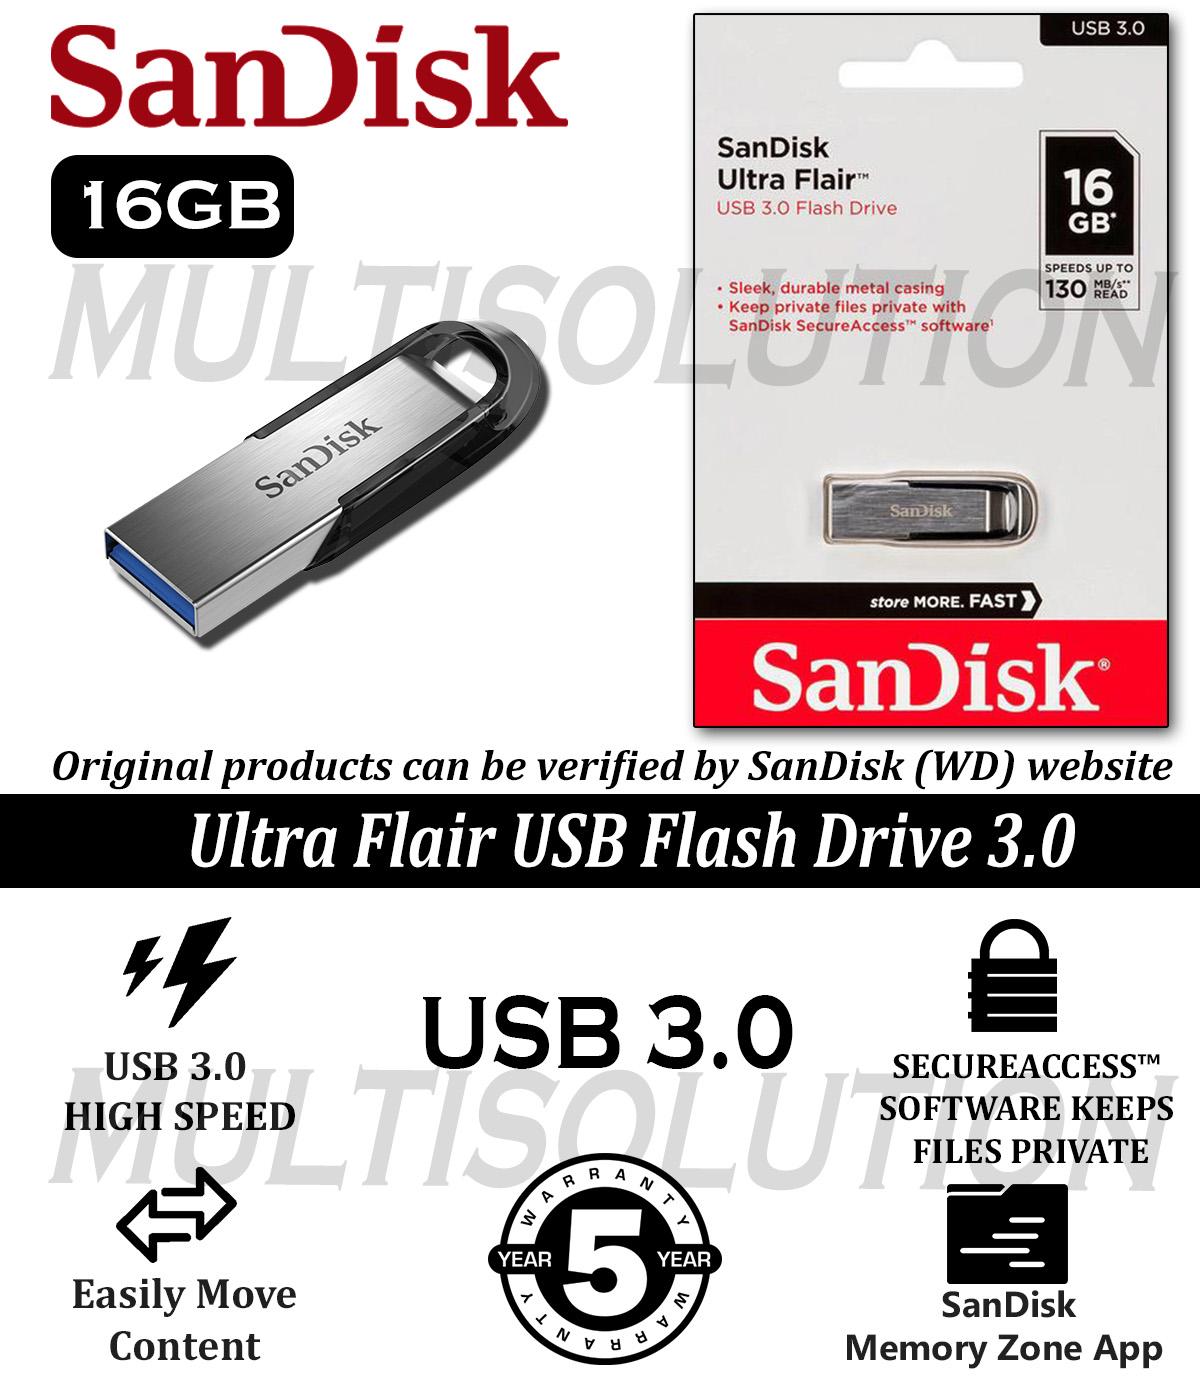 Sandisk 16gb Ultra Flair Cz73 Usb 3.0 - 150mb/s Speed - 5 Years Warranty